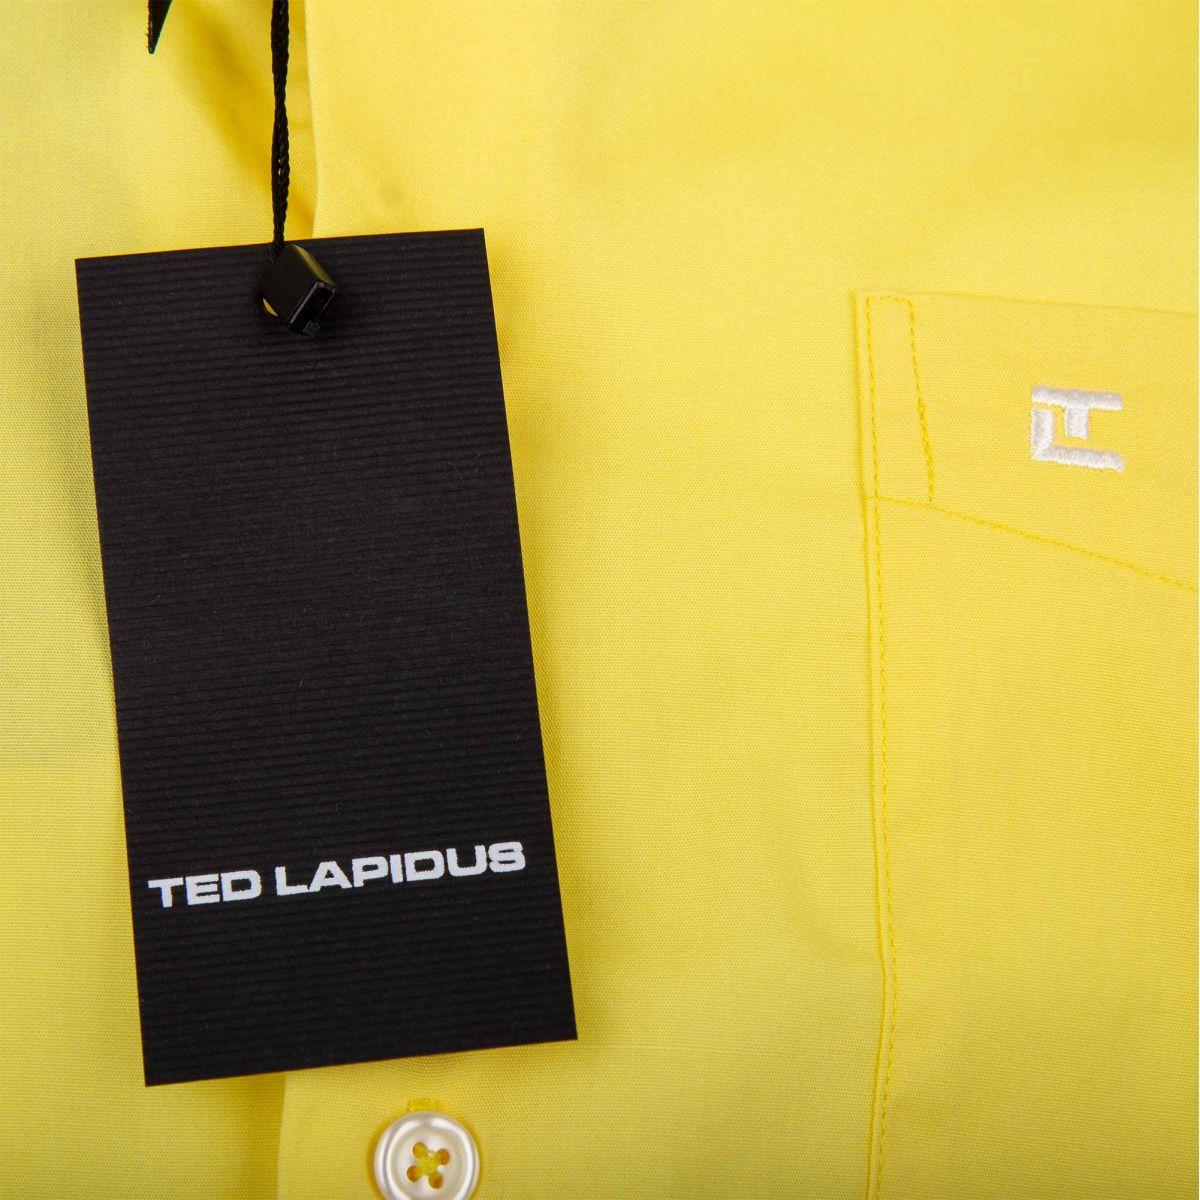 best website 99d11 98902 chemise-jaune-manches-courtes-homme-ted-lapidus.jpg